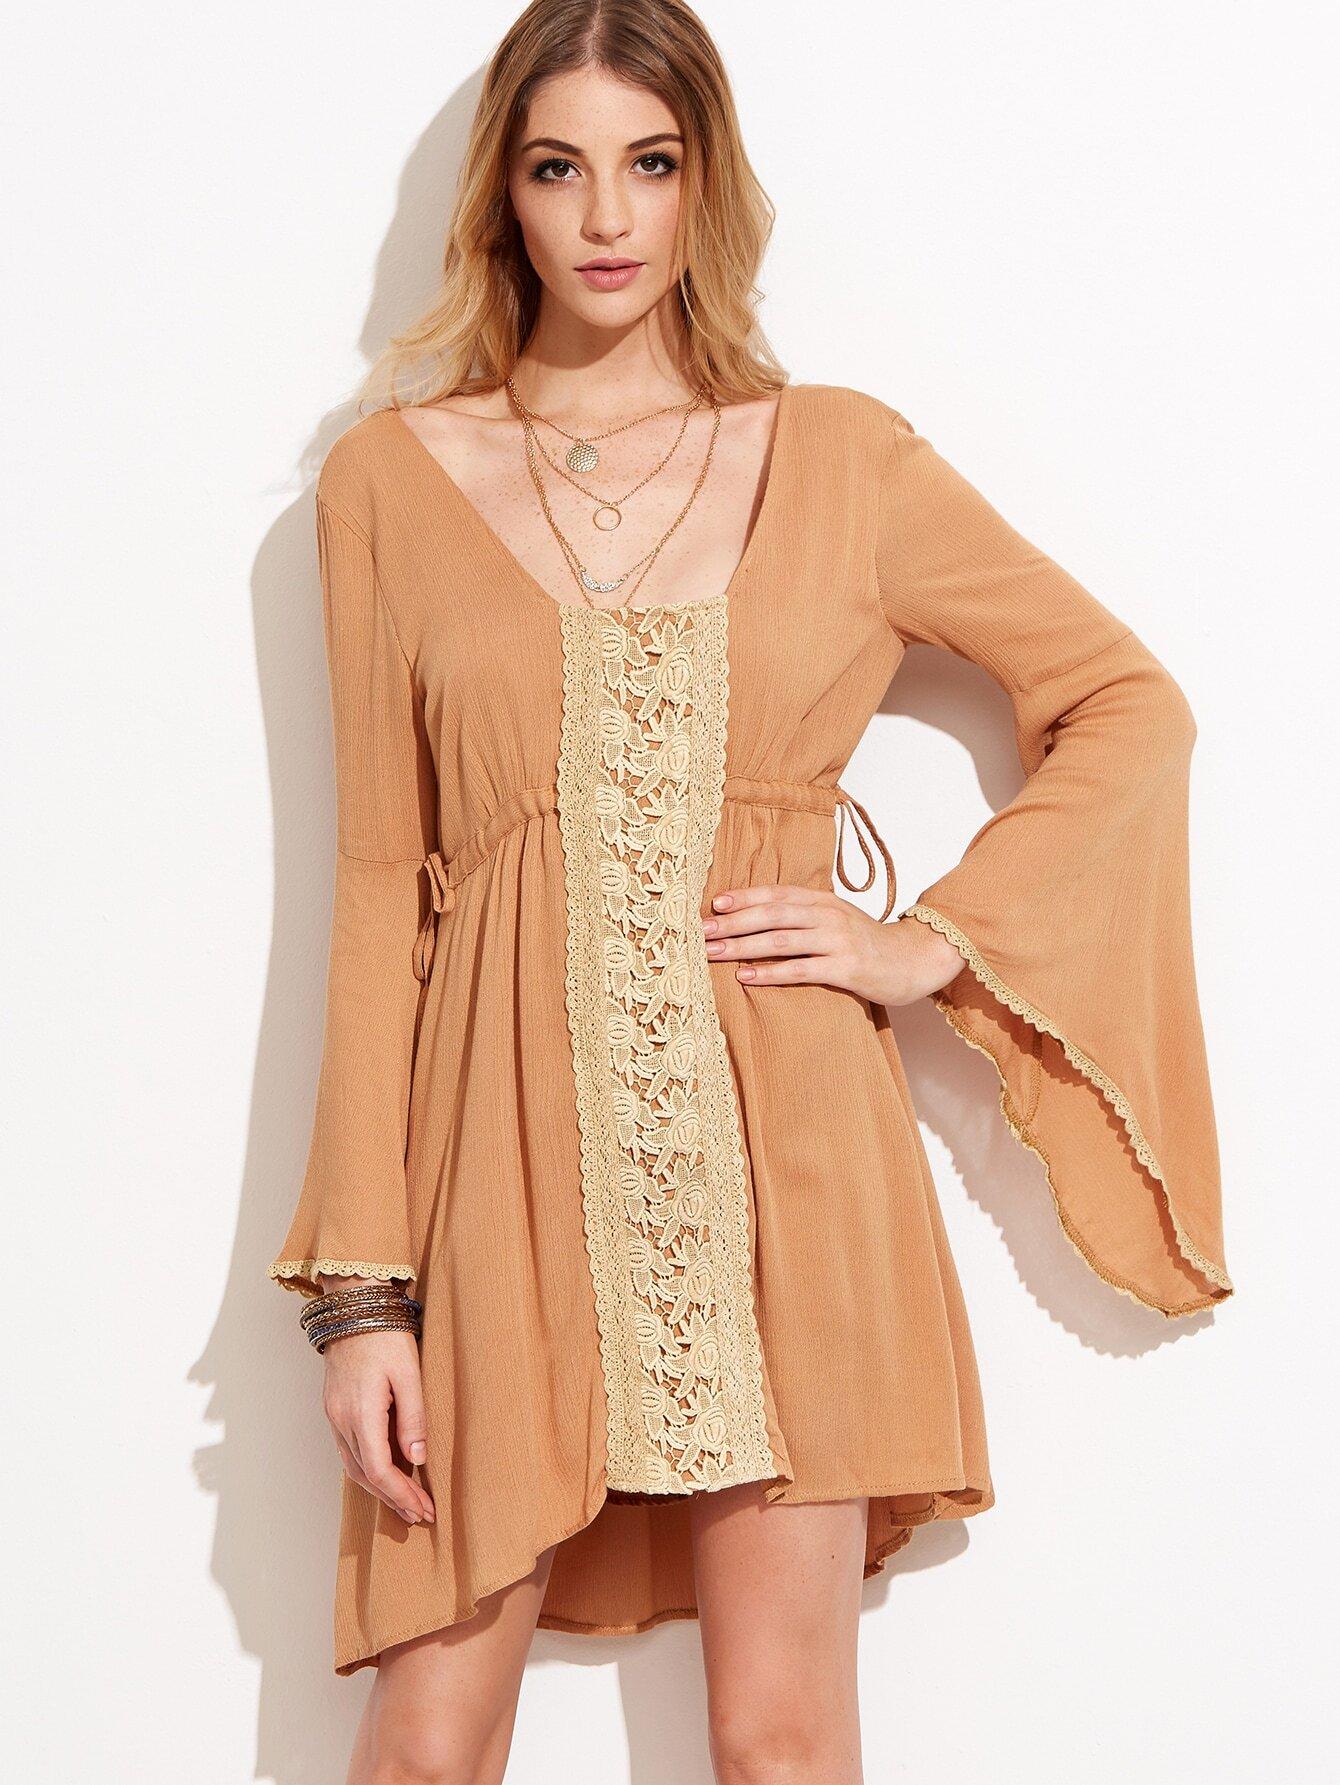 510cd1904e4 Camel Lace Trim Drawstring Waist Bell Sleeve Dress